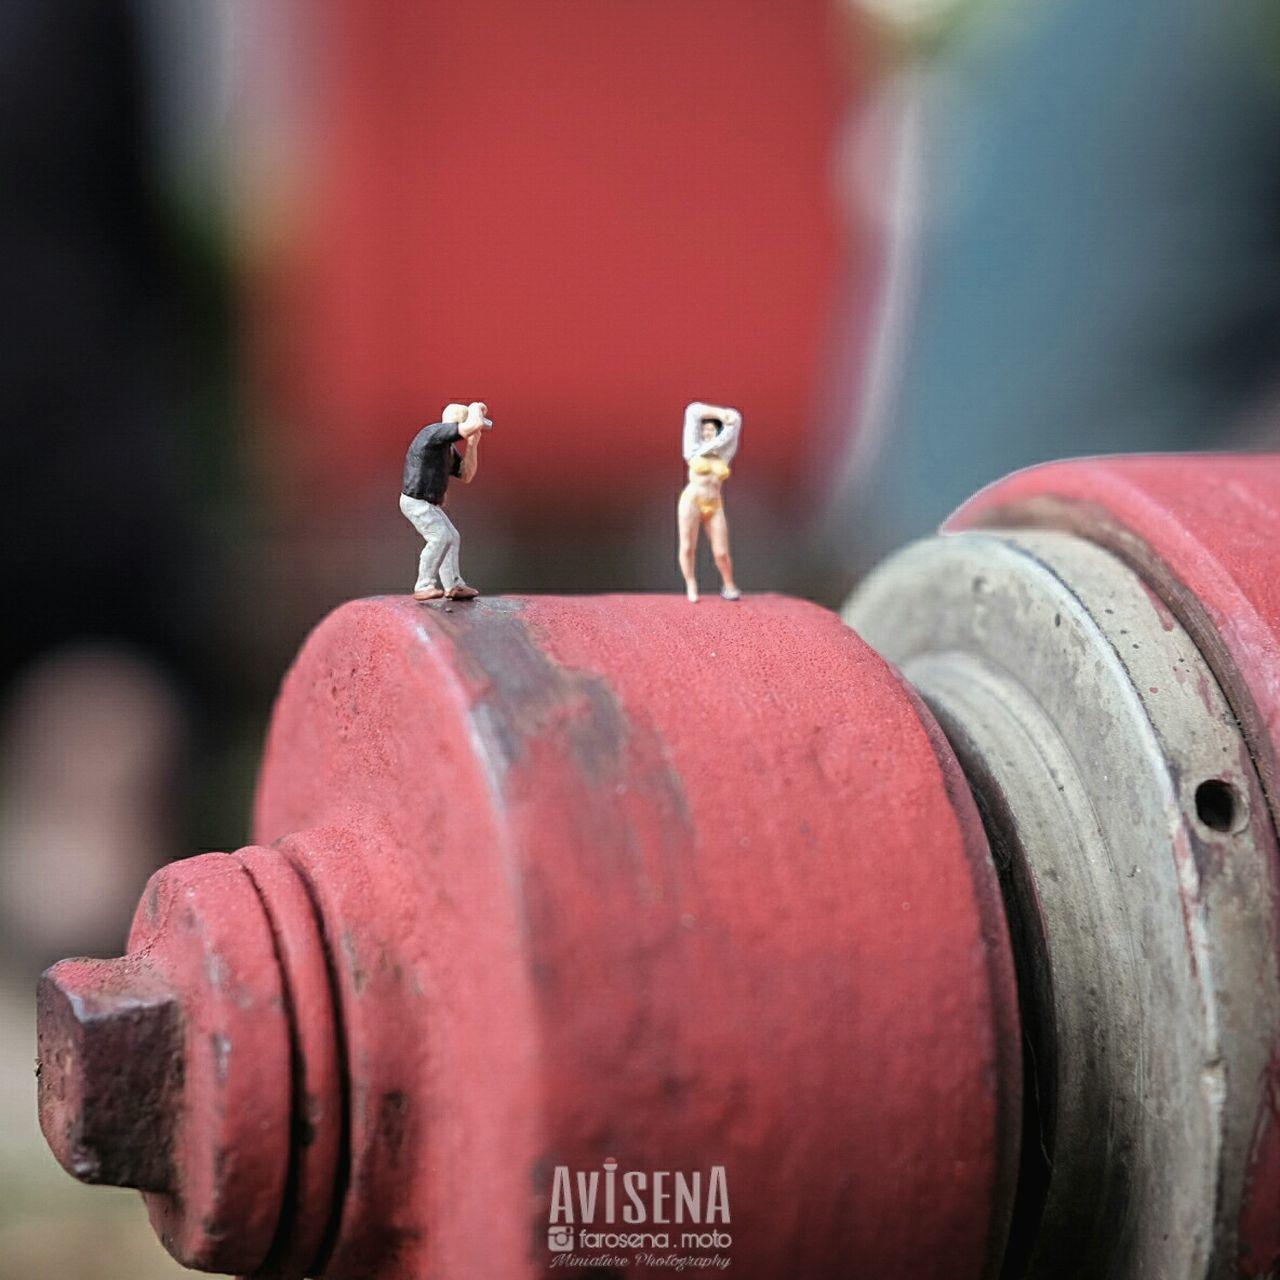 Miniature Photography: Model Photographer Miniatures Miniatureart Preiser Photographer In The Shot Photographer First Eyeem Photo